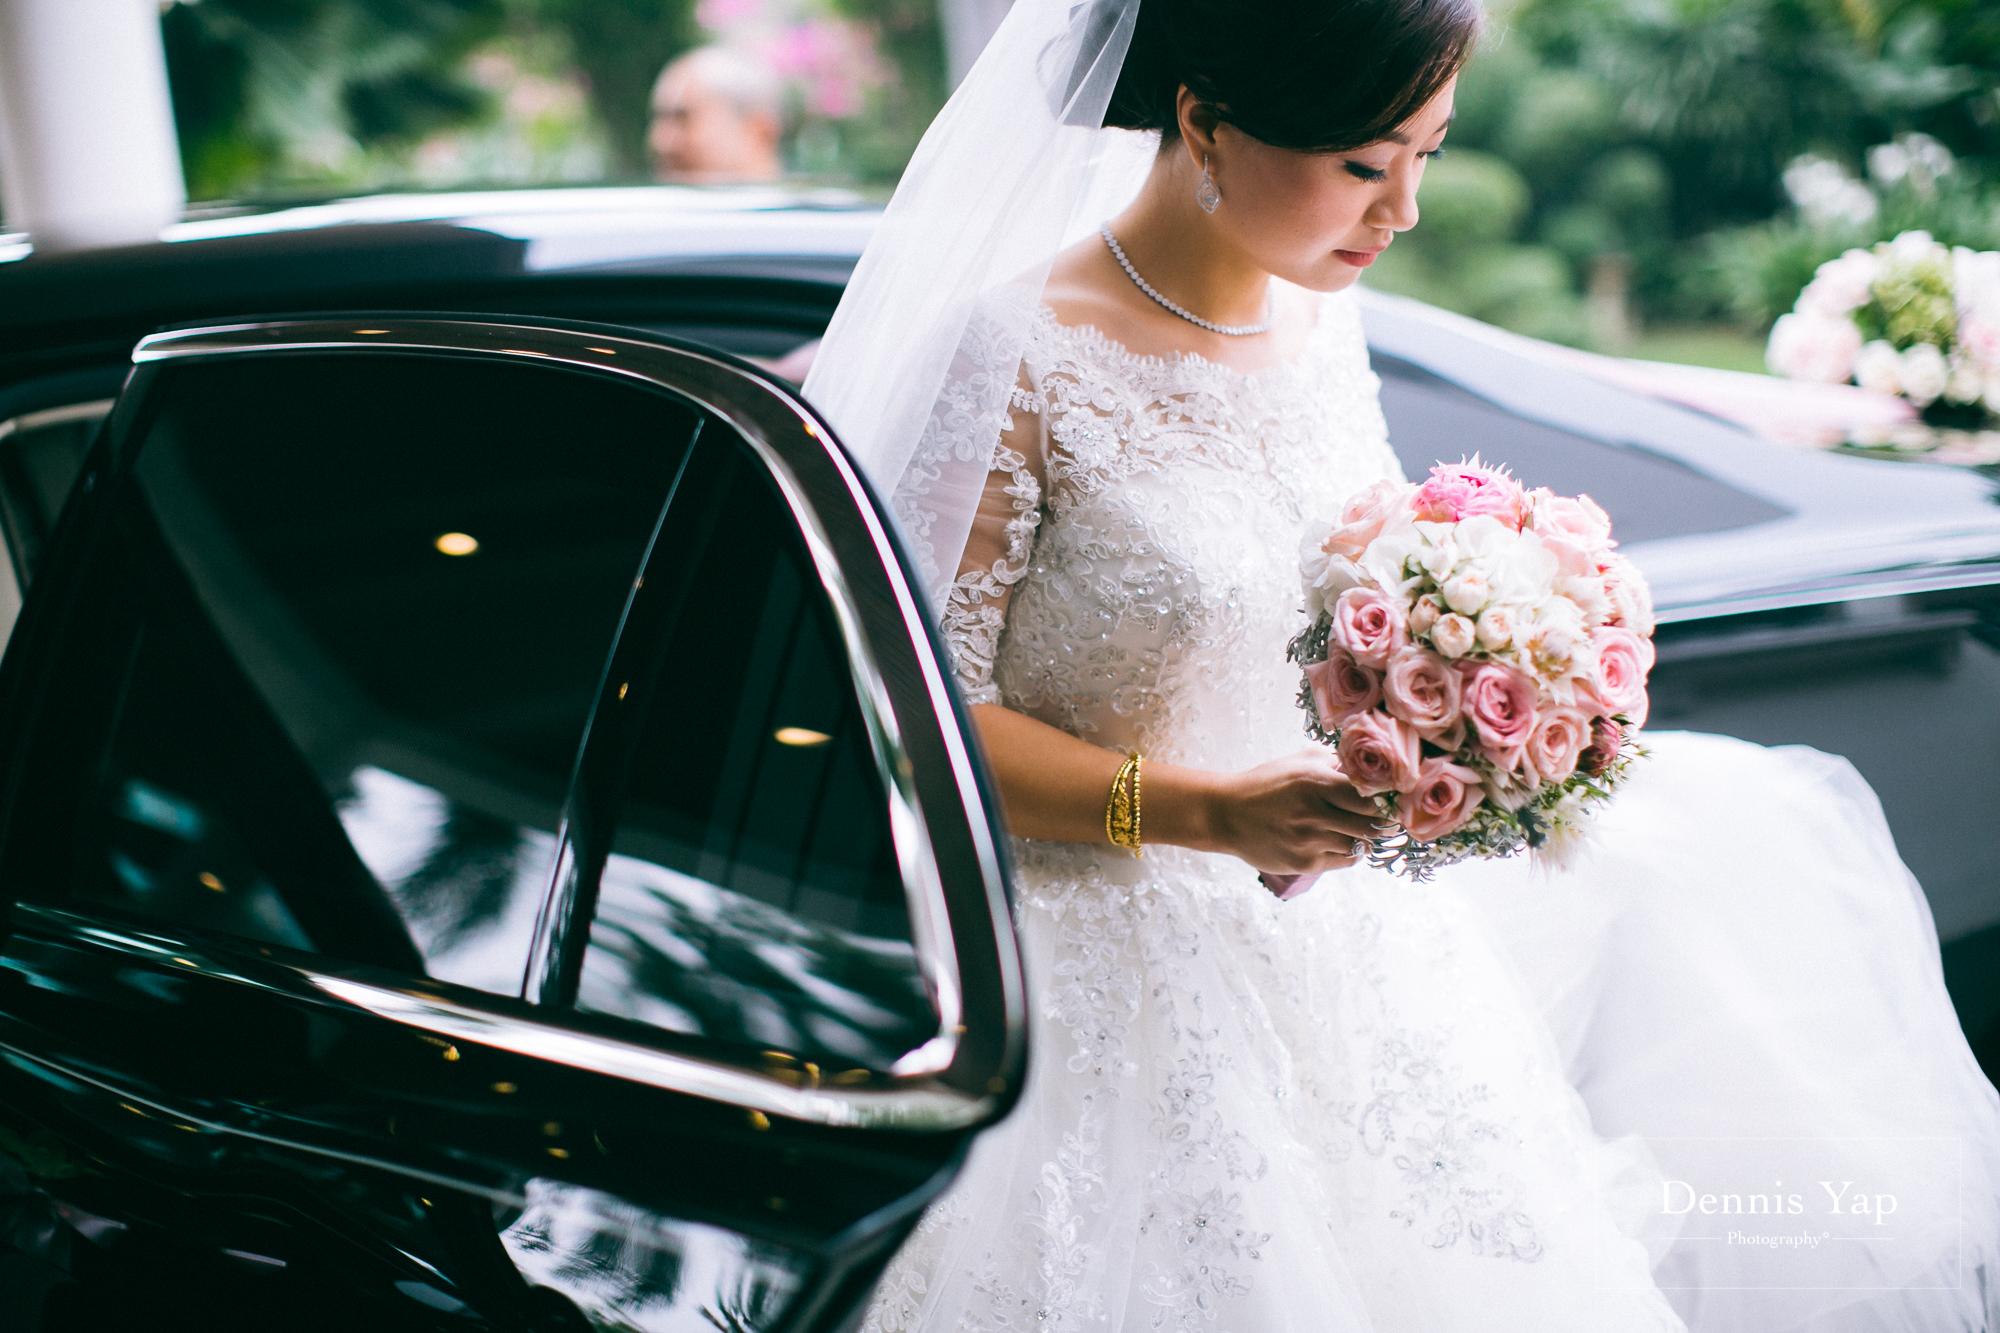 we chard sharon wedding day gate crash majestic hotel kuala lumpur moonlight dennis yap photography malaysia-27.jpg